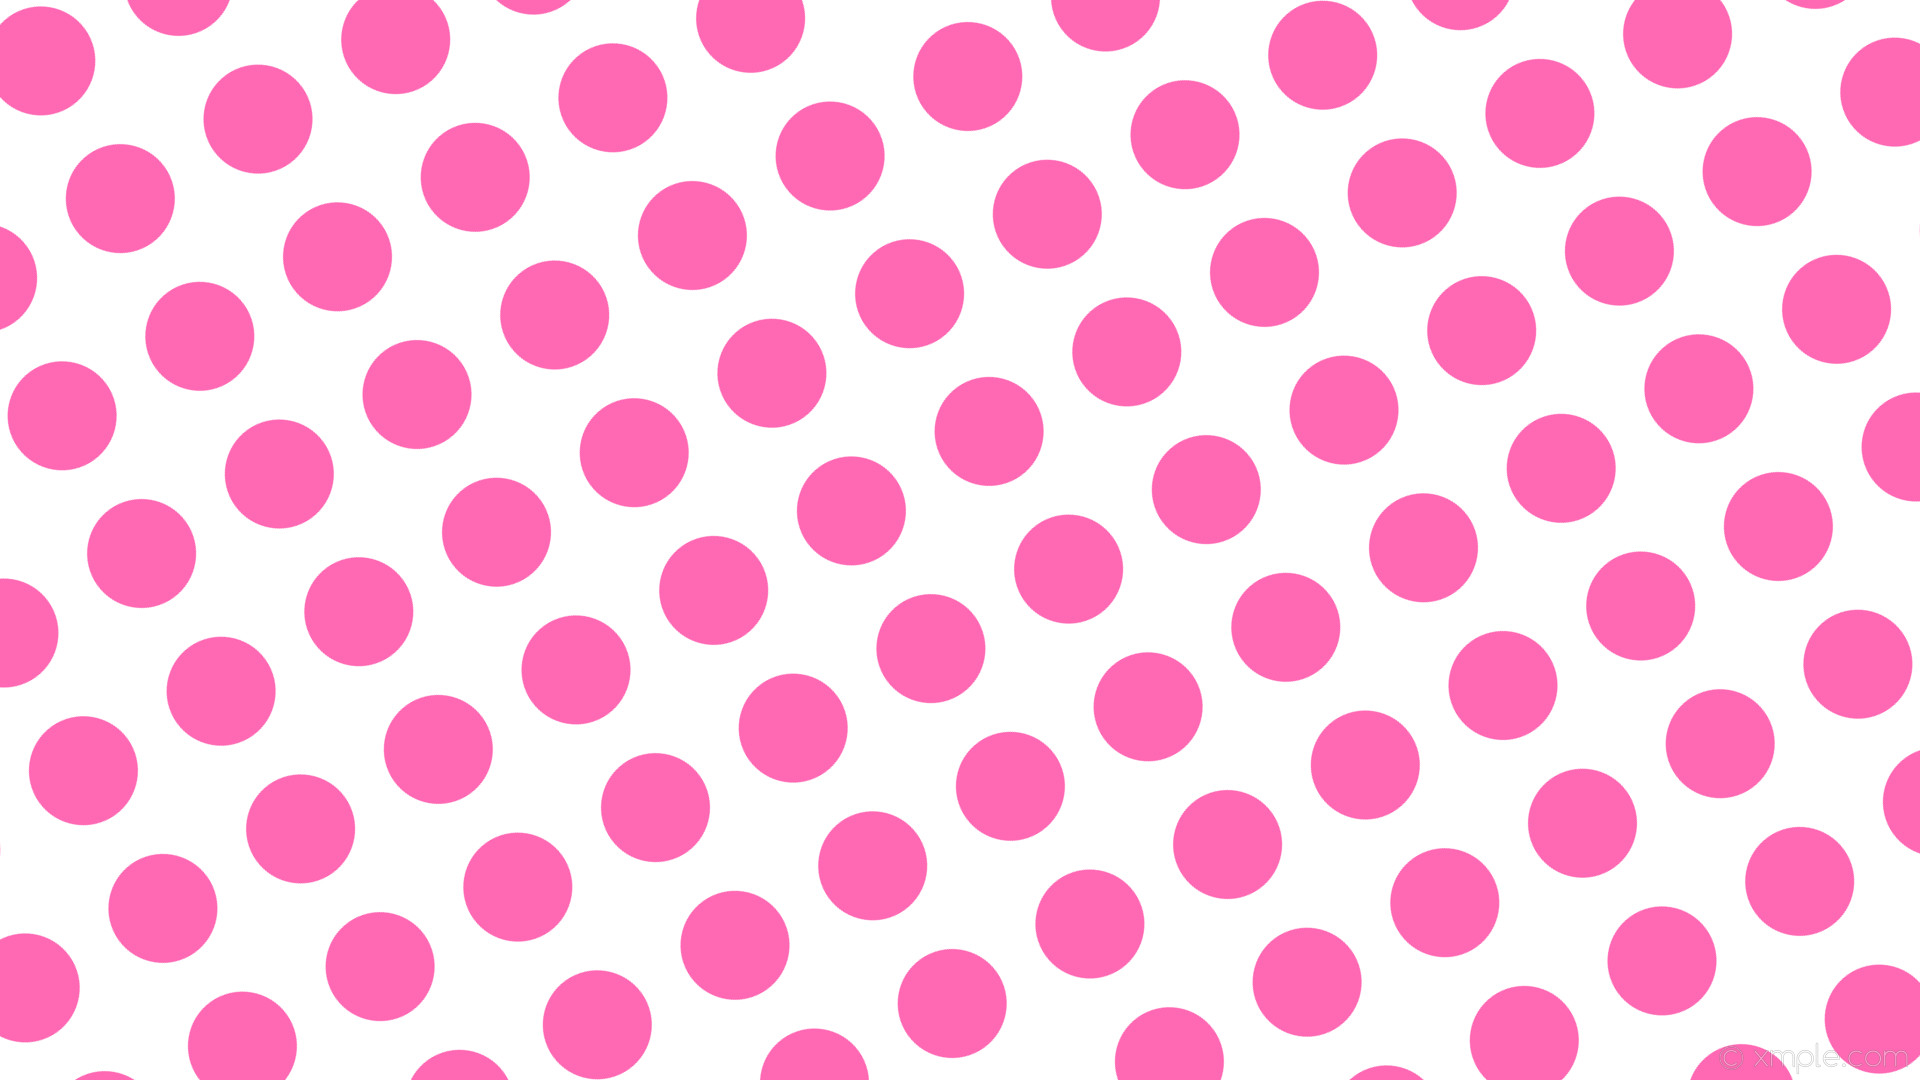 wallpaper white polka dots spots pink hot pink #ffffff #ff69b4 210° 109px  159px